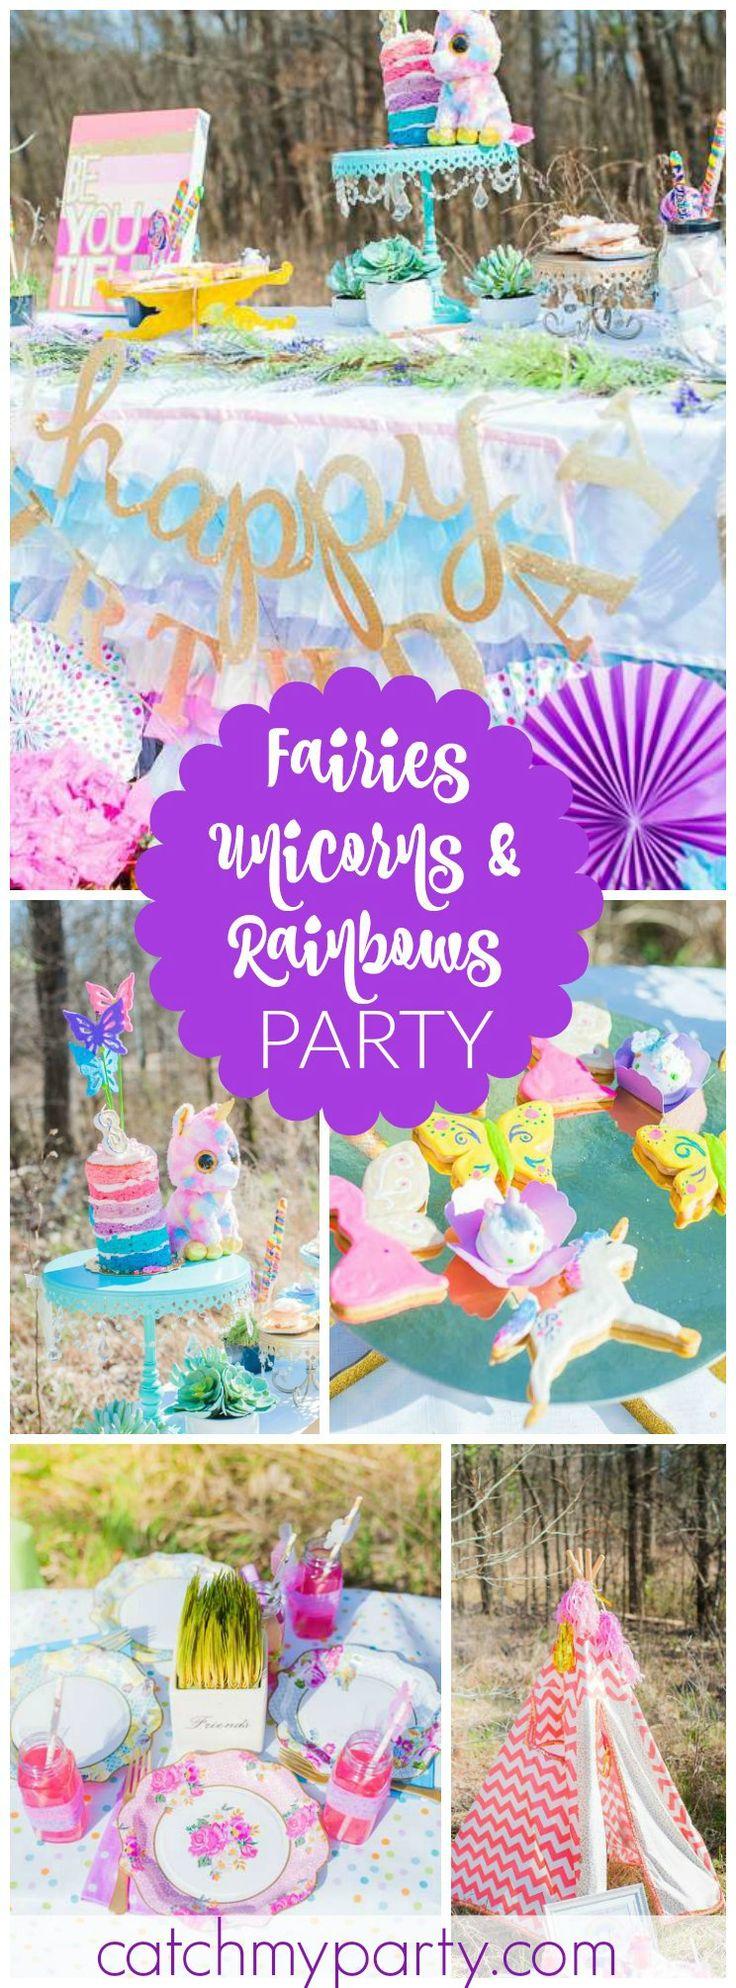 Fairies, Unicorns & Rainbows Party / Birthday